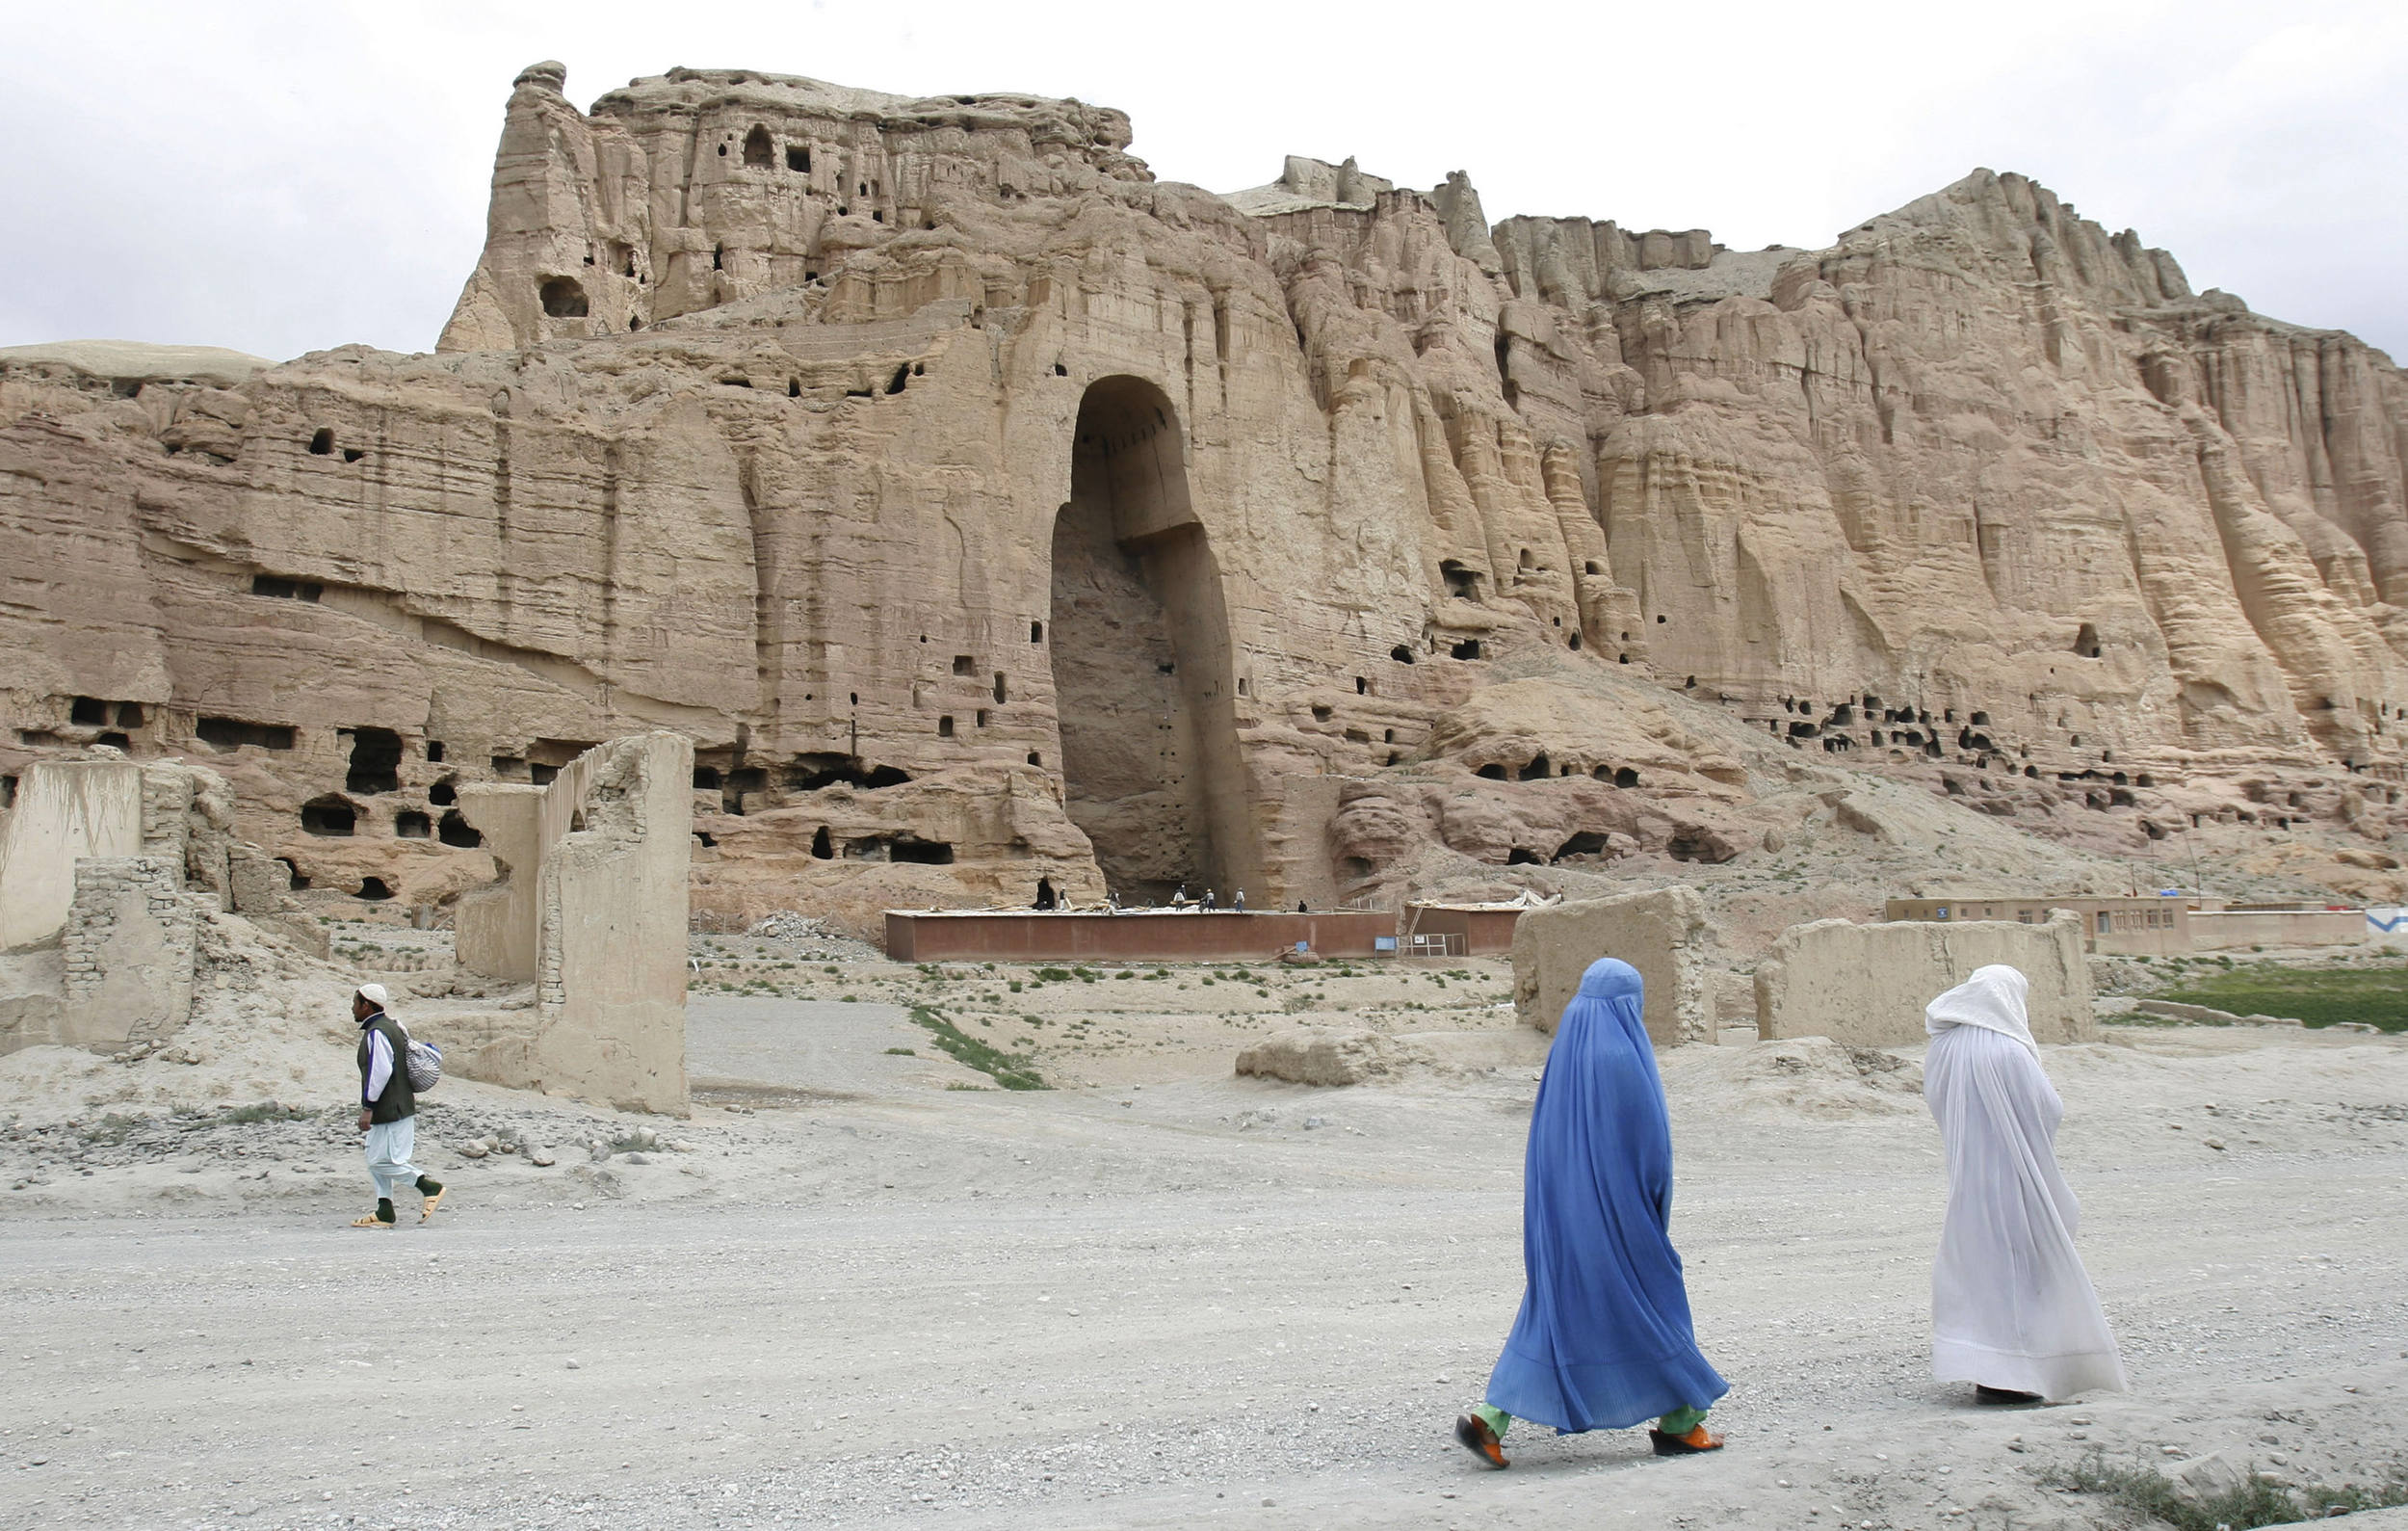 Image: Women walk past cliffs in Bamiyan, Afghanistan